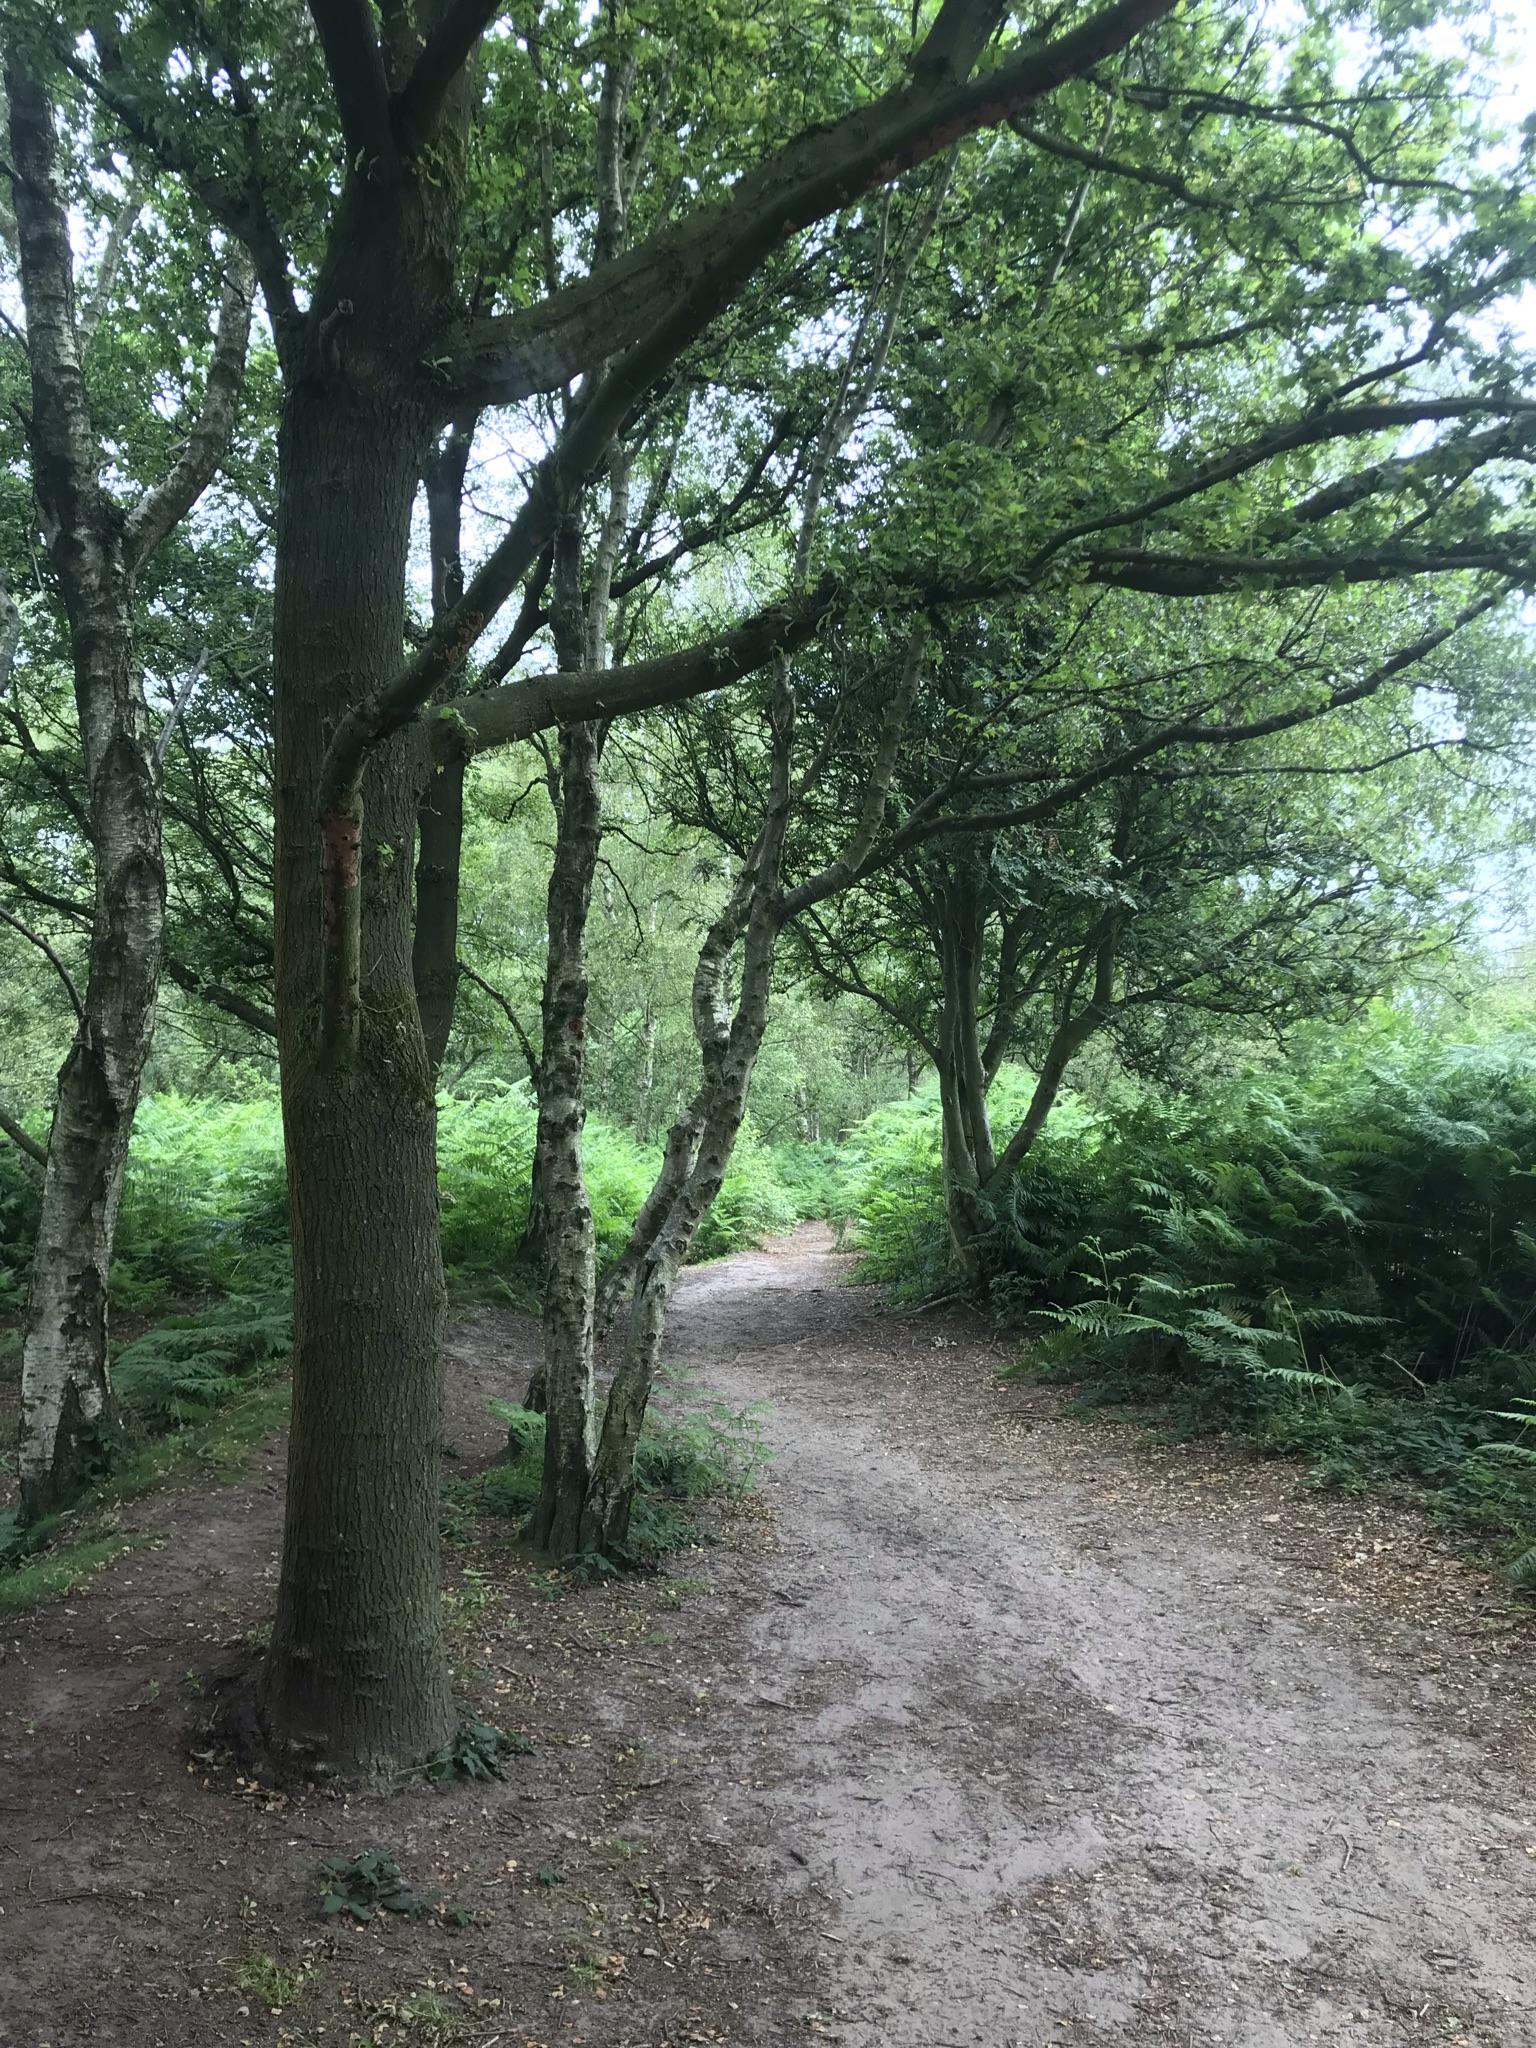 a sandy path through trees and bracken